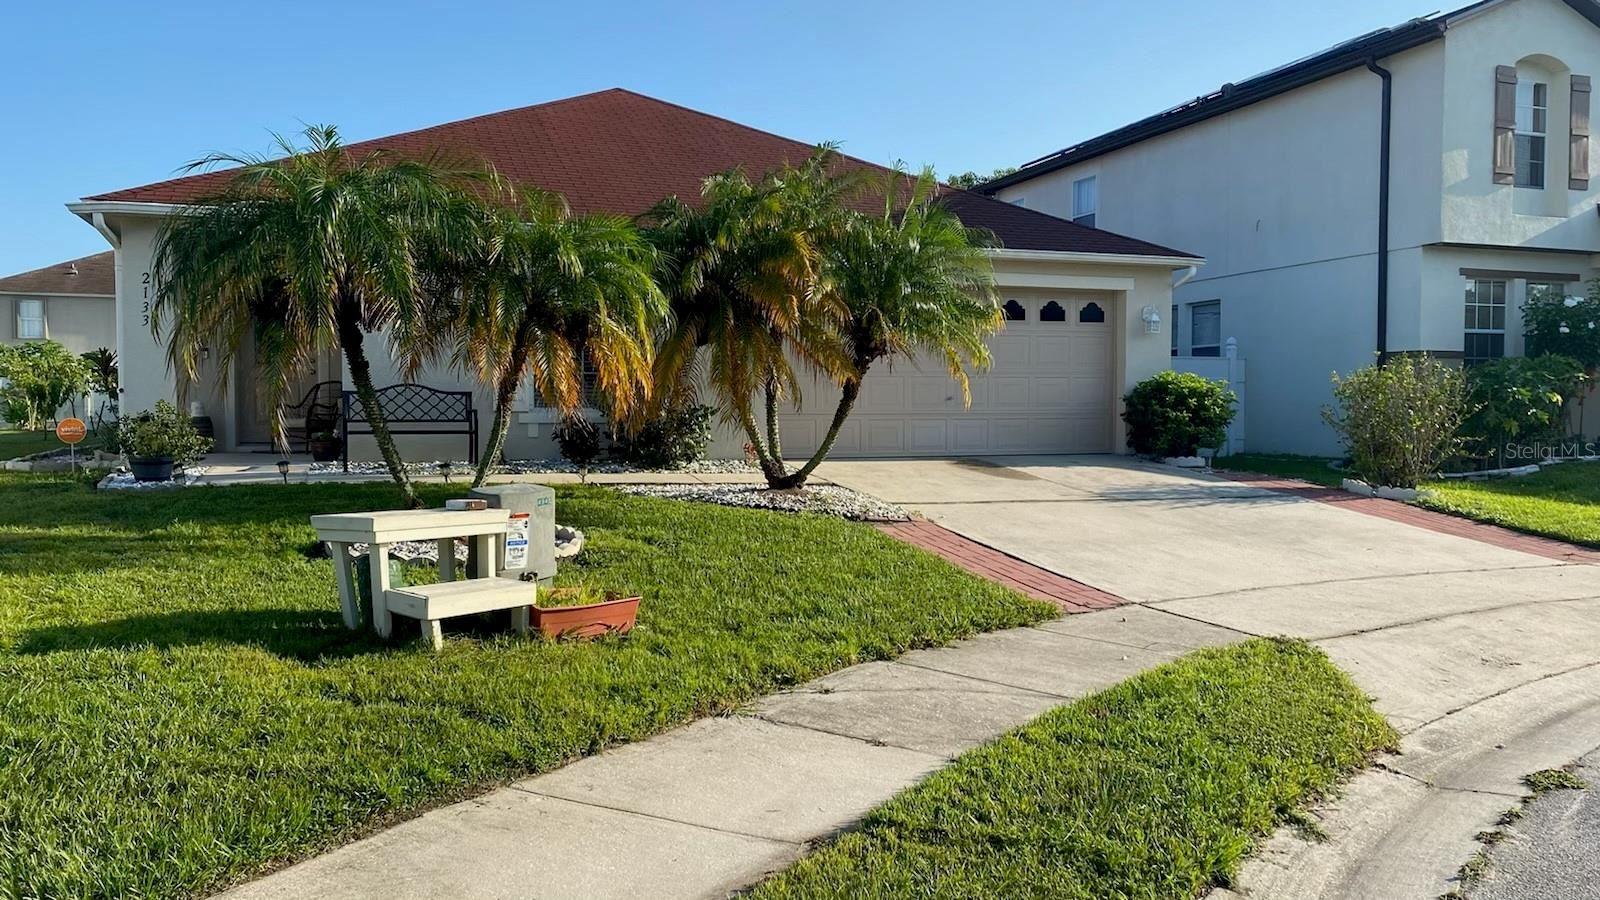 2133 HERITAGE VILLAGE LANE, Orlando, FL 32837 - #: O5974933